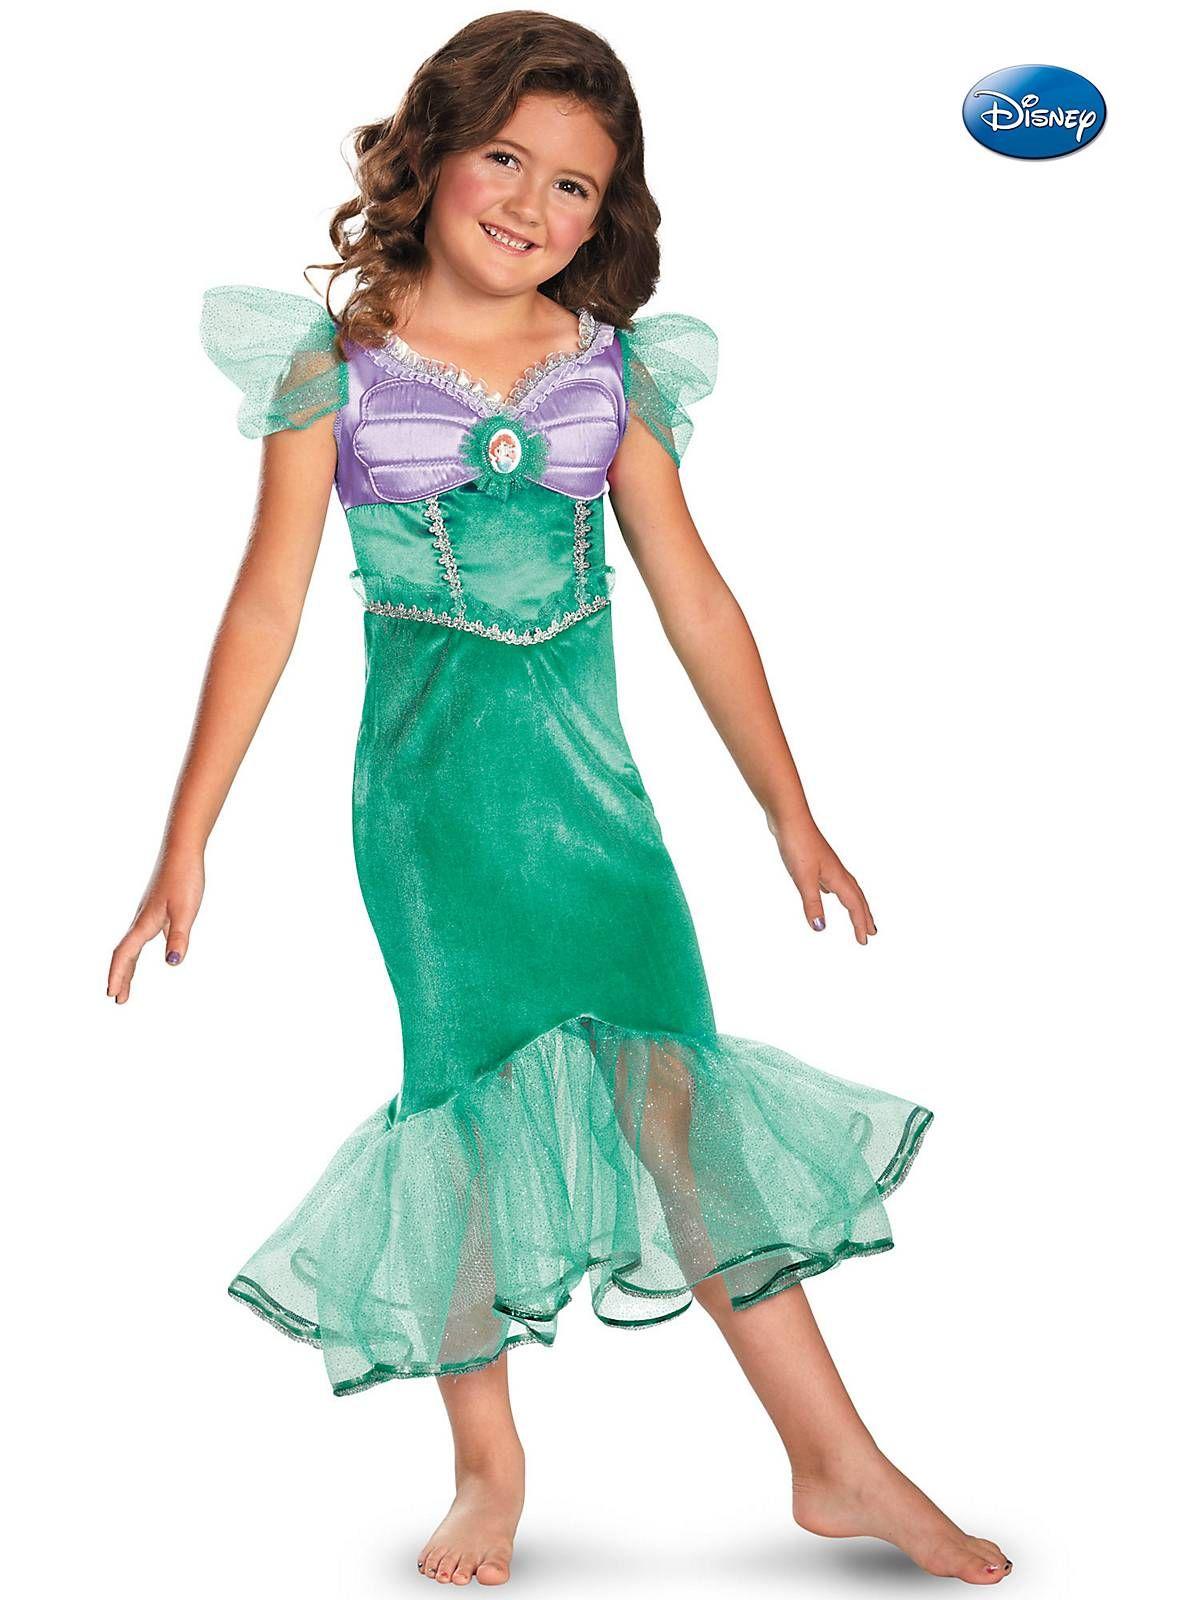 Ariel Sparkle Costume | Girls Disney Princess Costumes | My Favorite ...